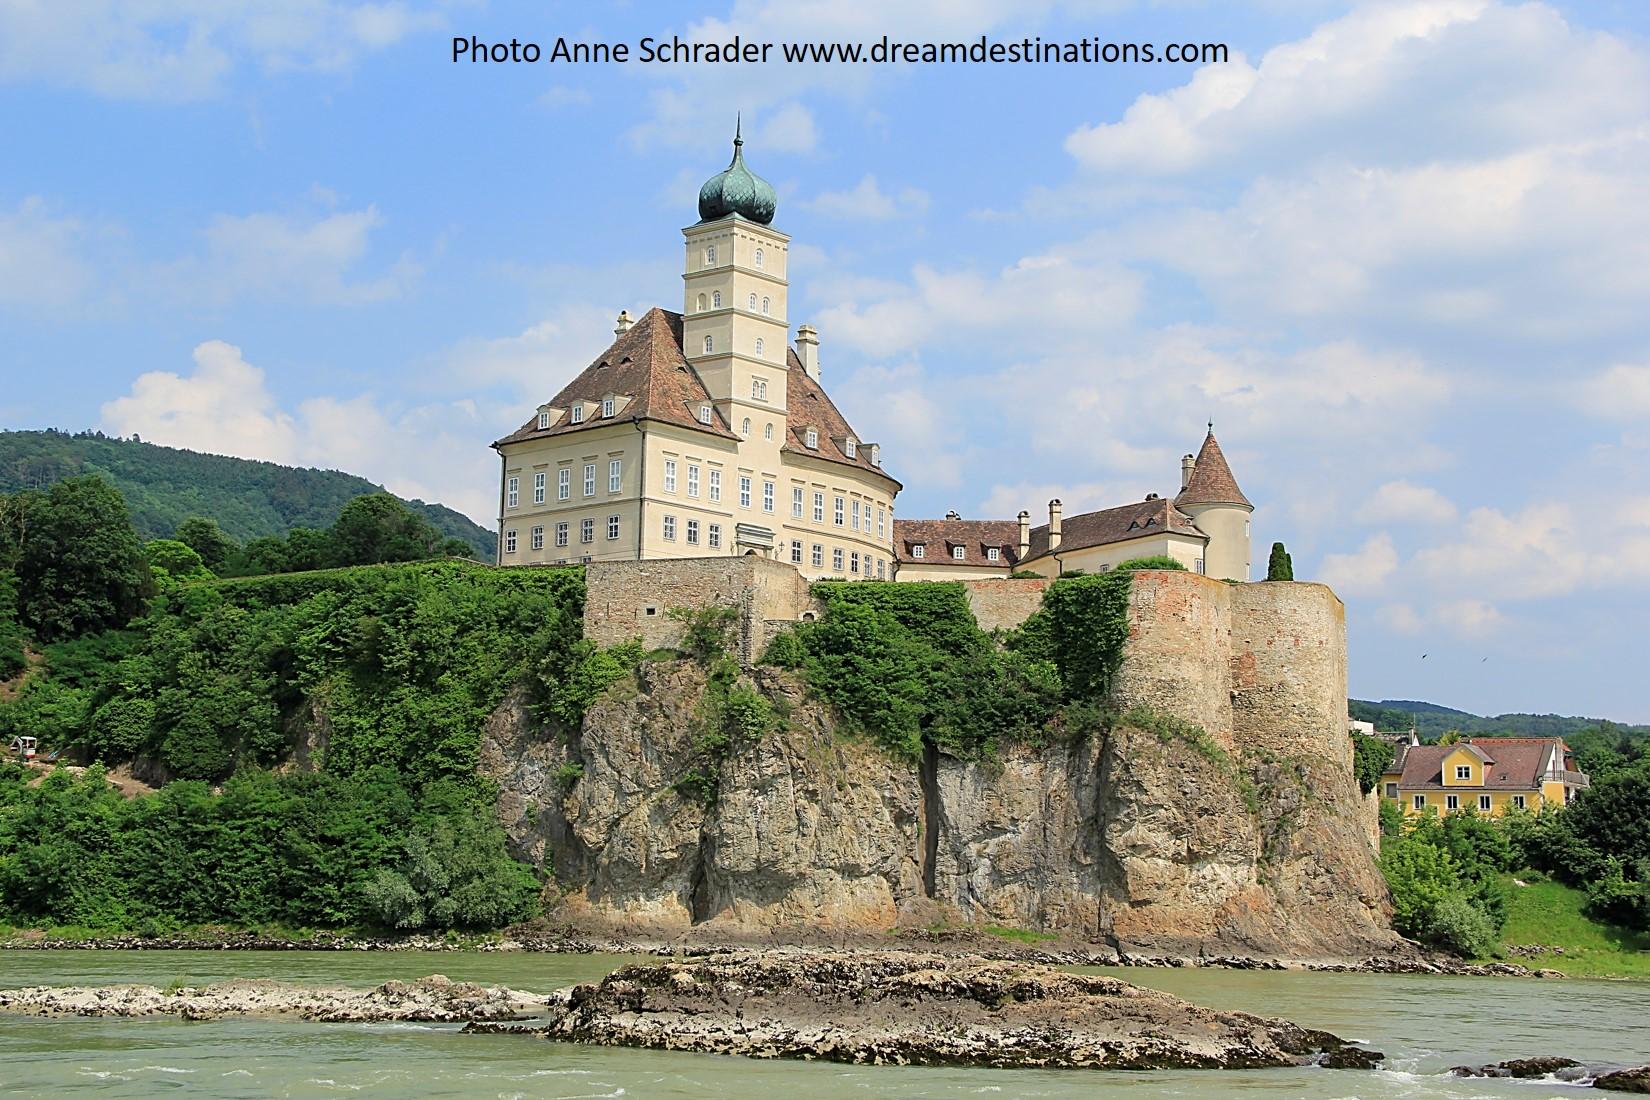 Schobuhl Castle